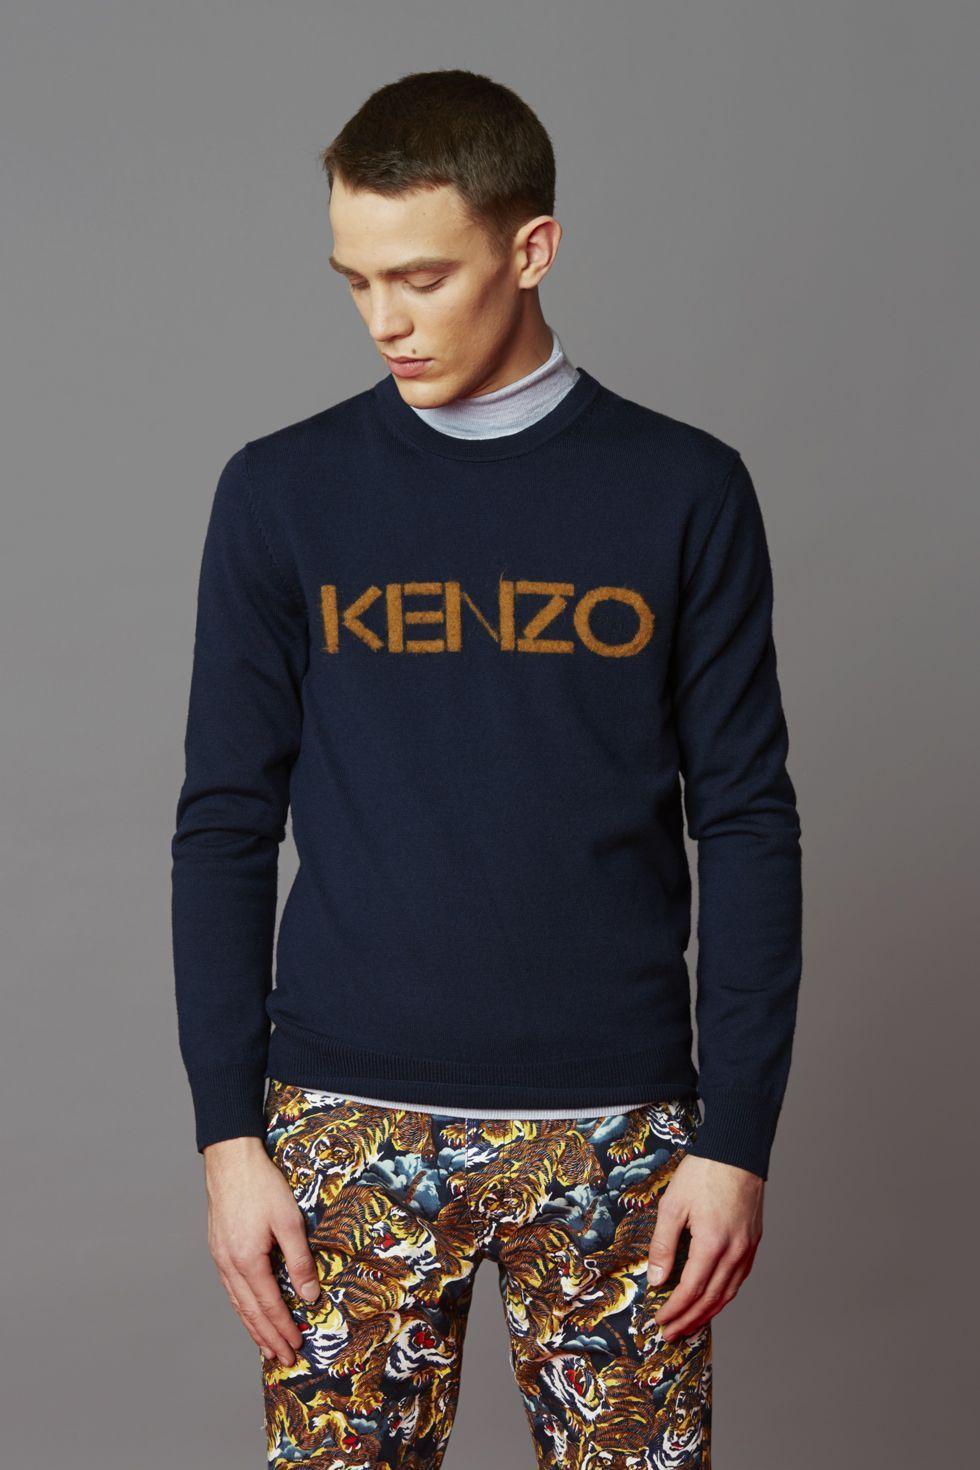 Kenzo KENZO LOGO SWEATER Kenzo Icons Men Kenzo E shop